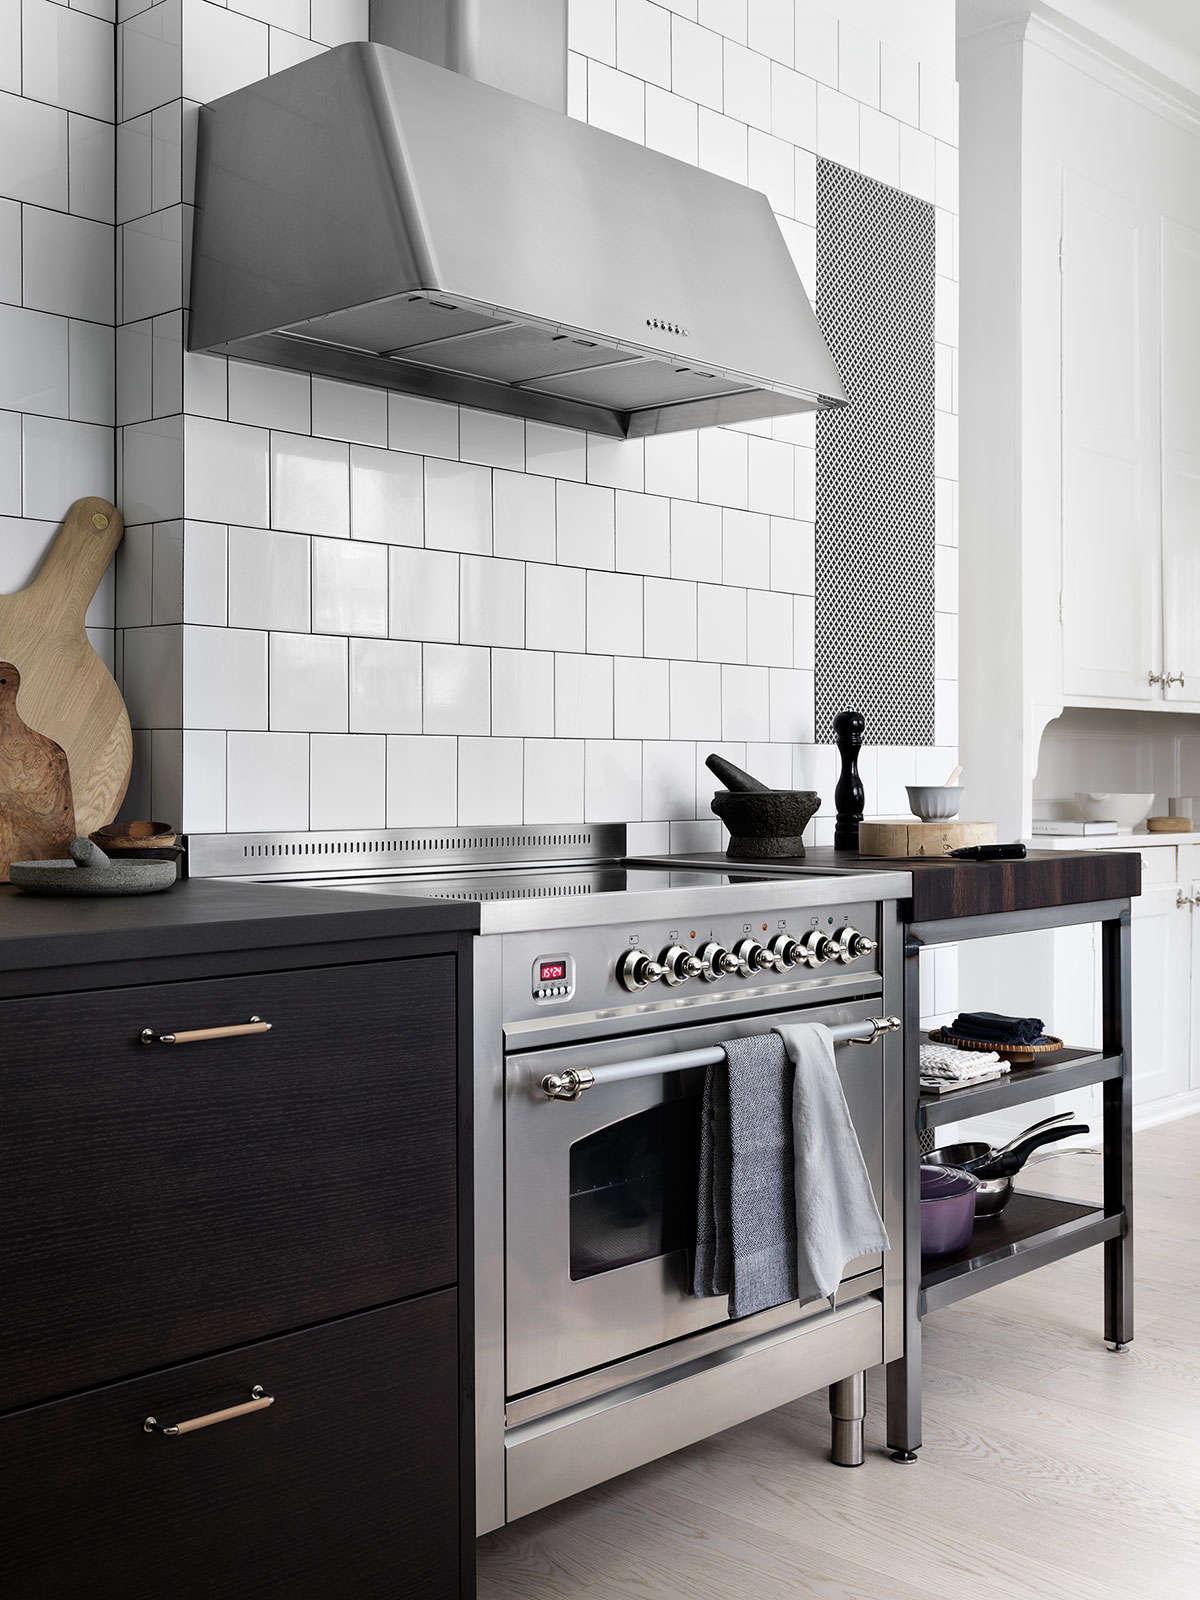 bistro kitchen in ash brown by ballingslov of sweden remodelista 7 17